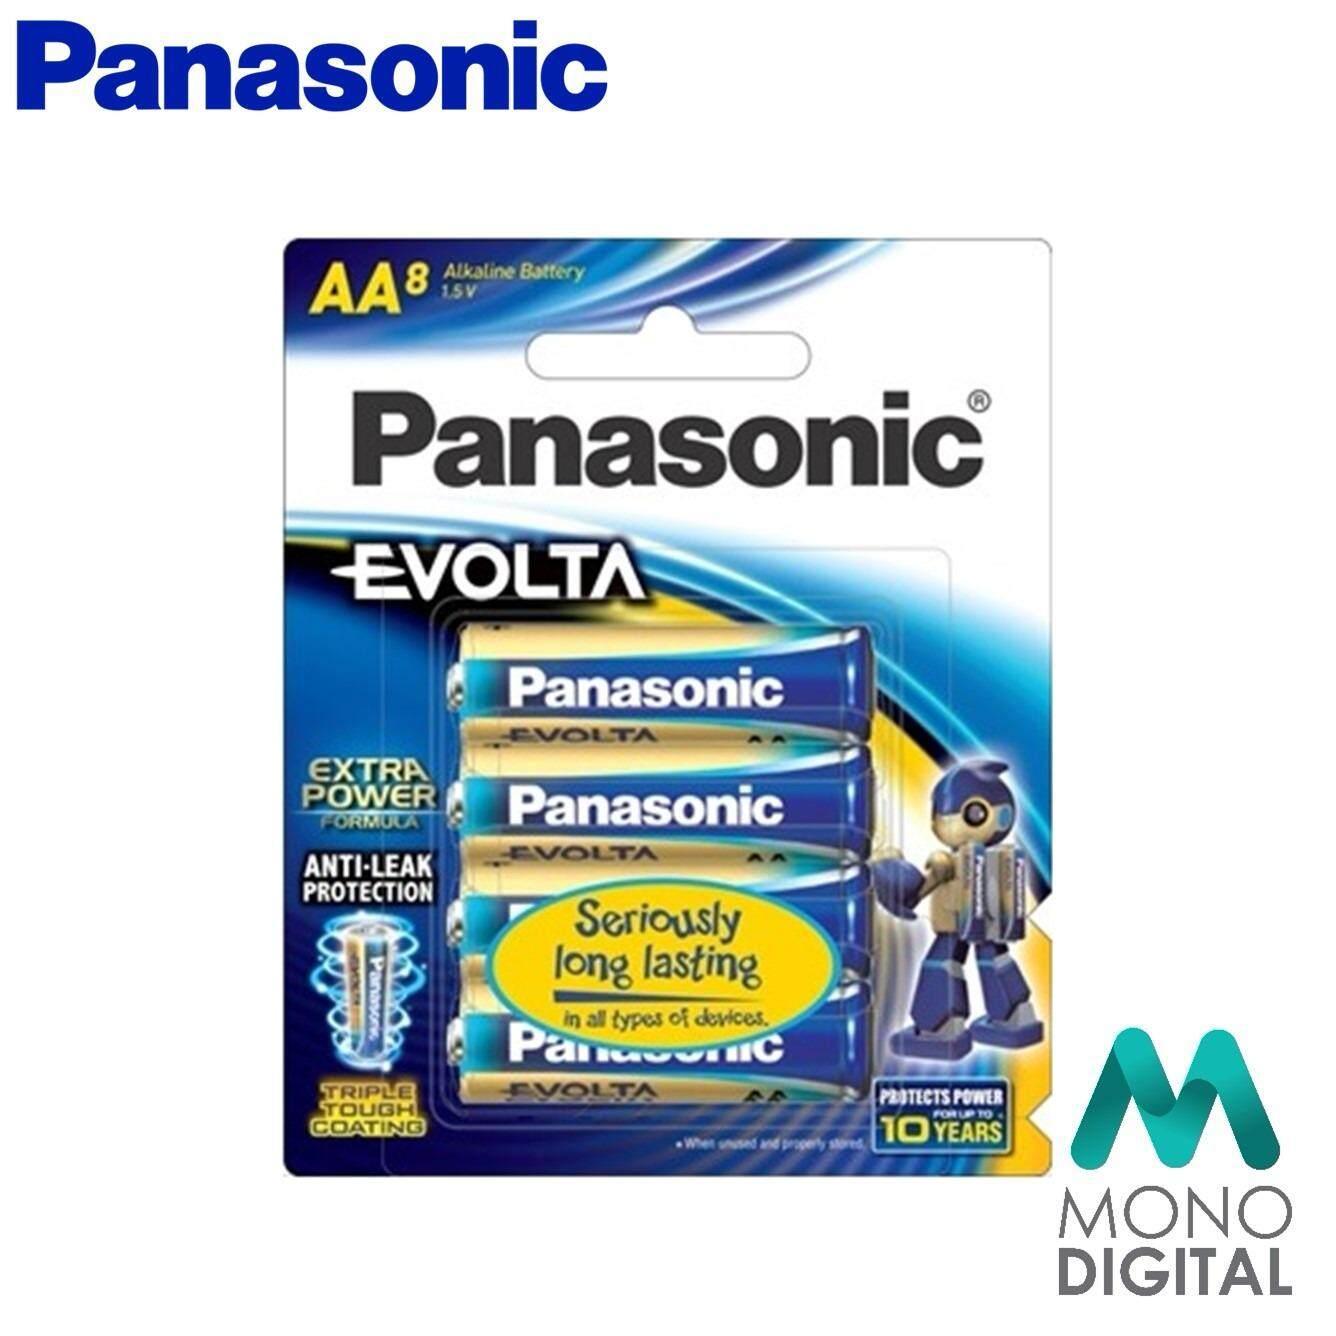 Panasonic Evolta Alkaline AA size 8pcs pack Battery (Panasonic Malaysia) (LR6EG/8B)